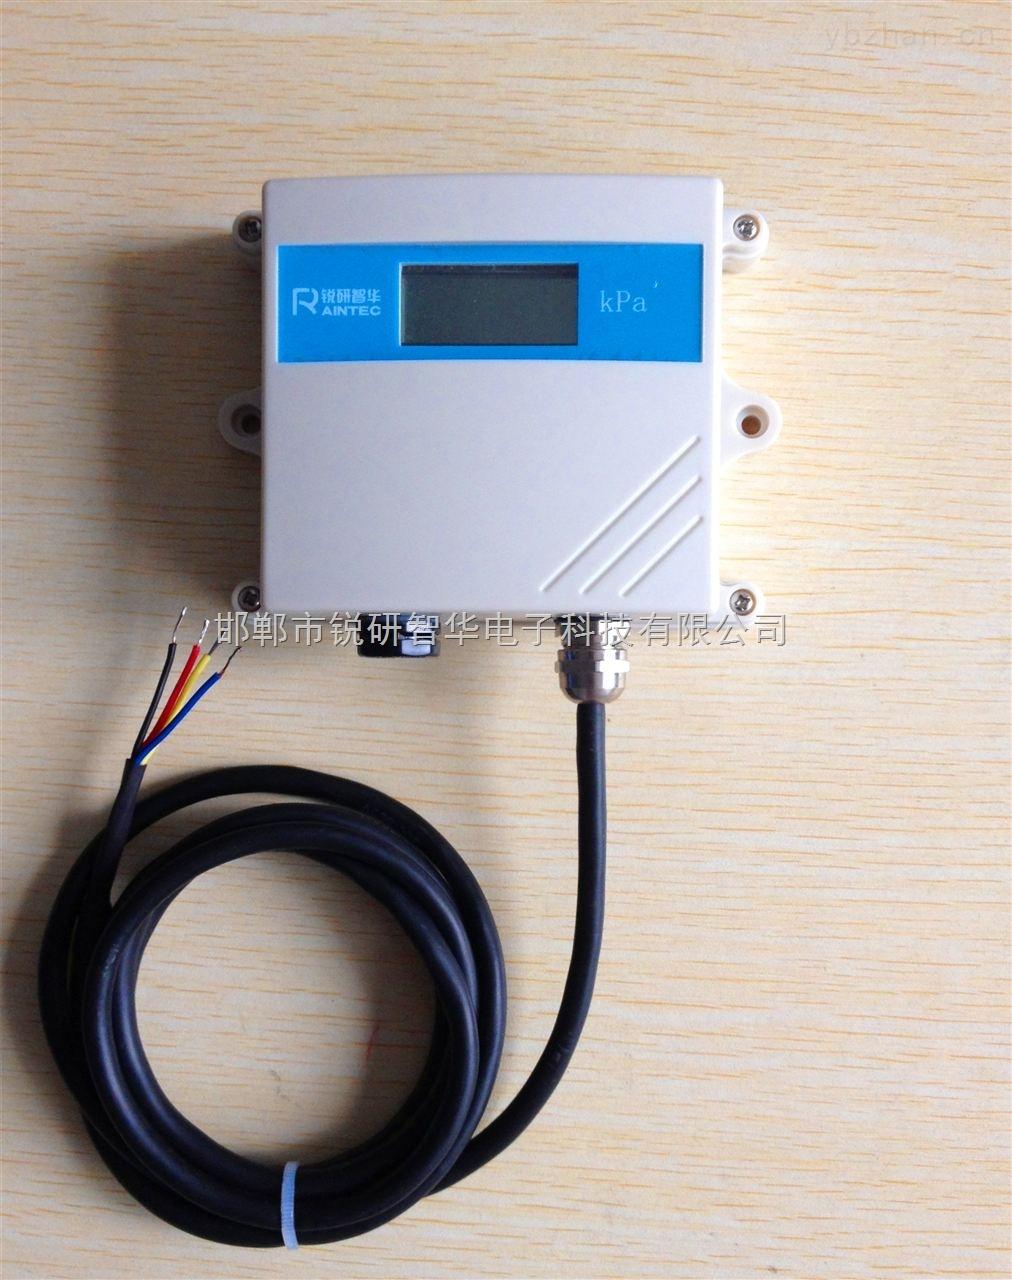 RY-JQYB-D-液晶显示大气压力传感器(气象监测)